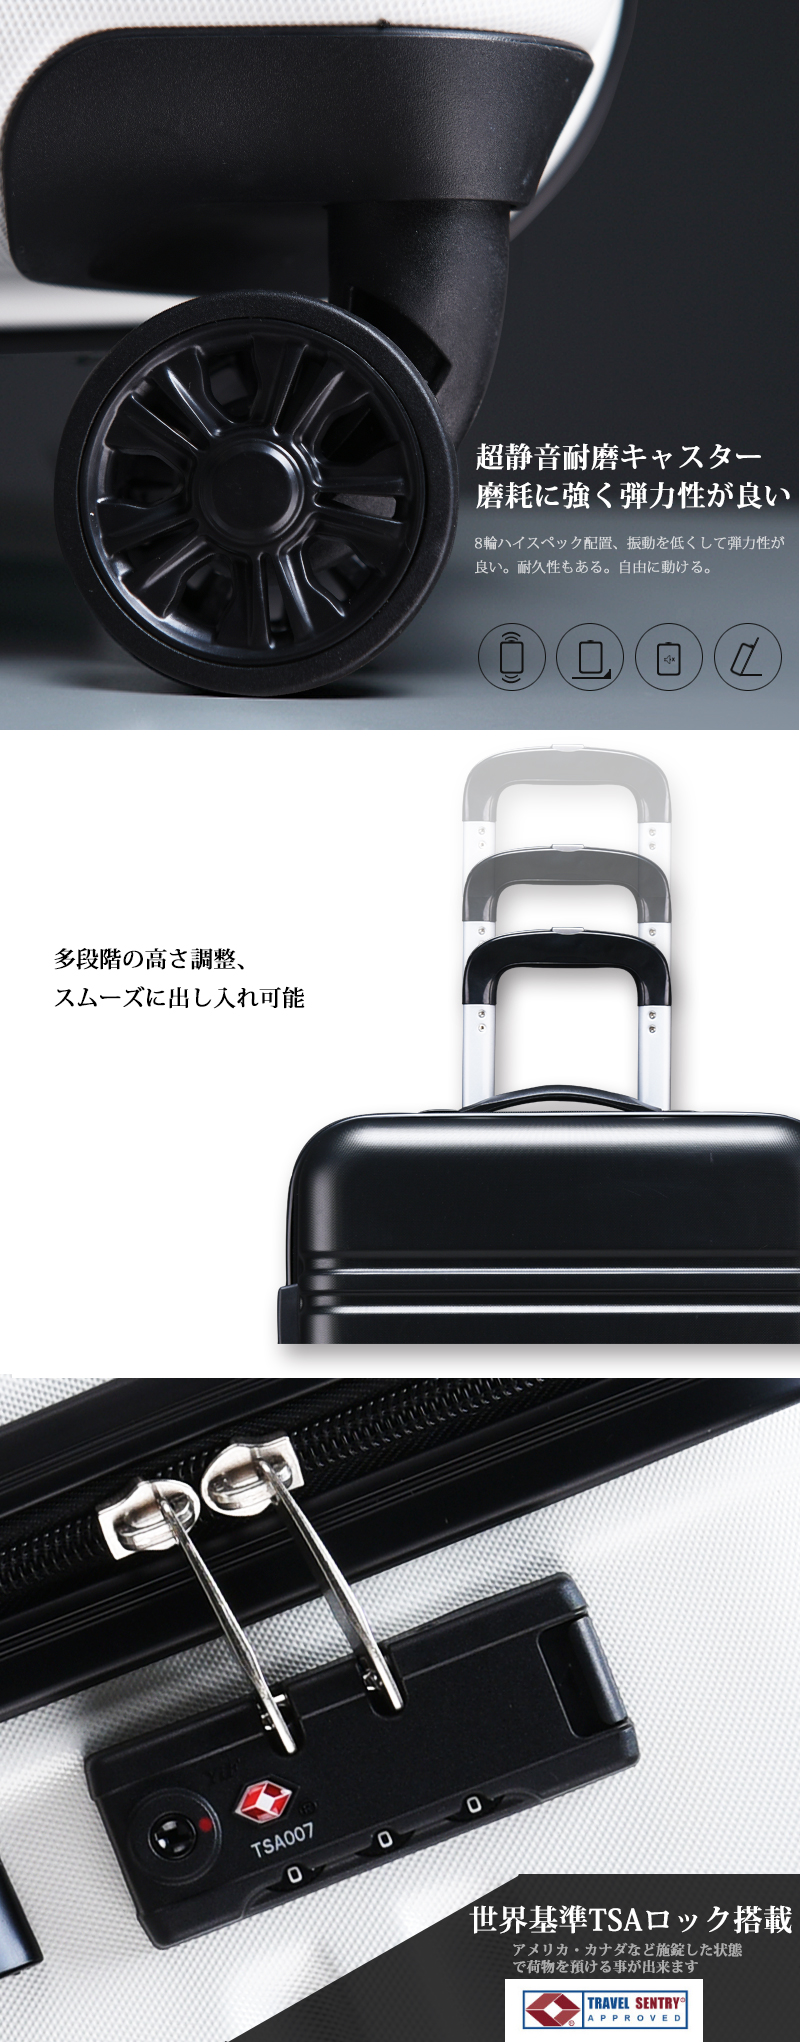 89a698bced 商品名:小型 sサイズ スーツケース 機内持ち込み キャリーケース キャリーバッグ 旅行かばん トランク キャリーバック 旅行バッグ